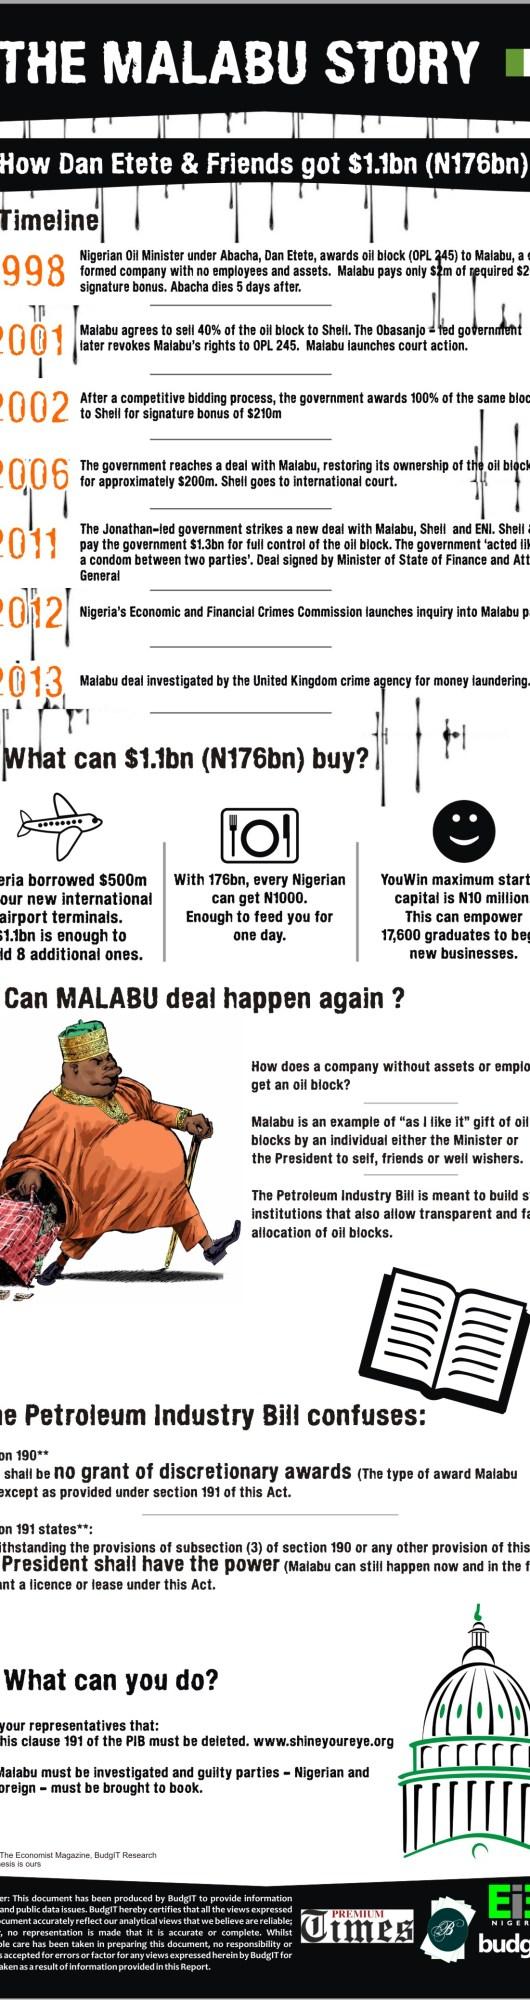 MALABU NEW